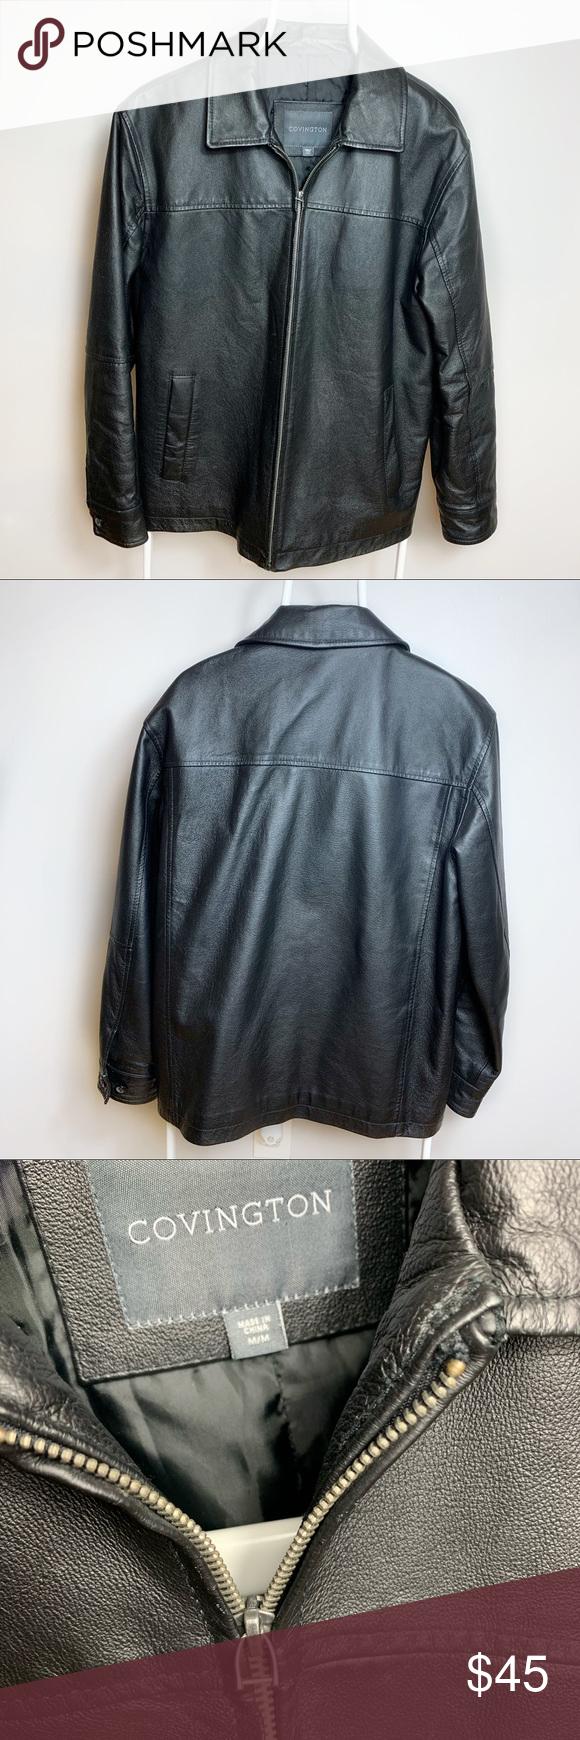 Covington Leather Jacket Men S Black M In 2021 Leather Jacket Men Real Leather Jacket Mens Jackets [ 1740 x 580 Pixel ]